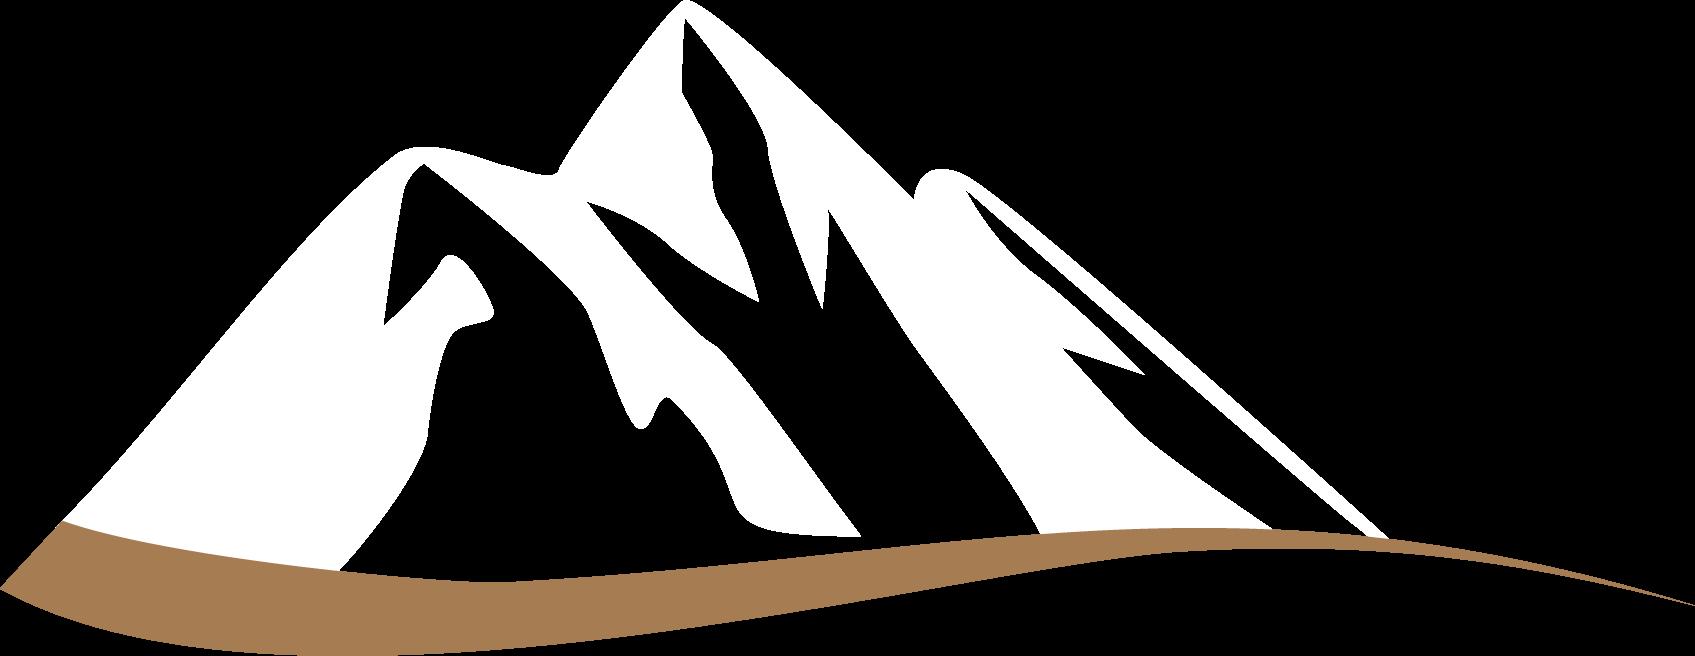 Mountain Ridge clipart transparent Clipart 210x210 Only Transparent Image